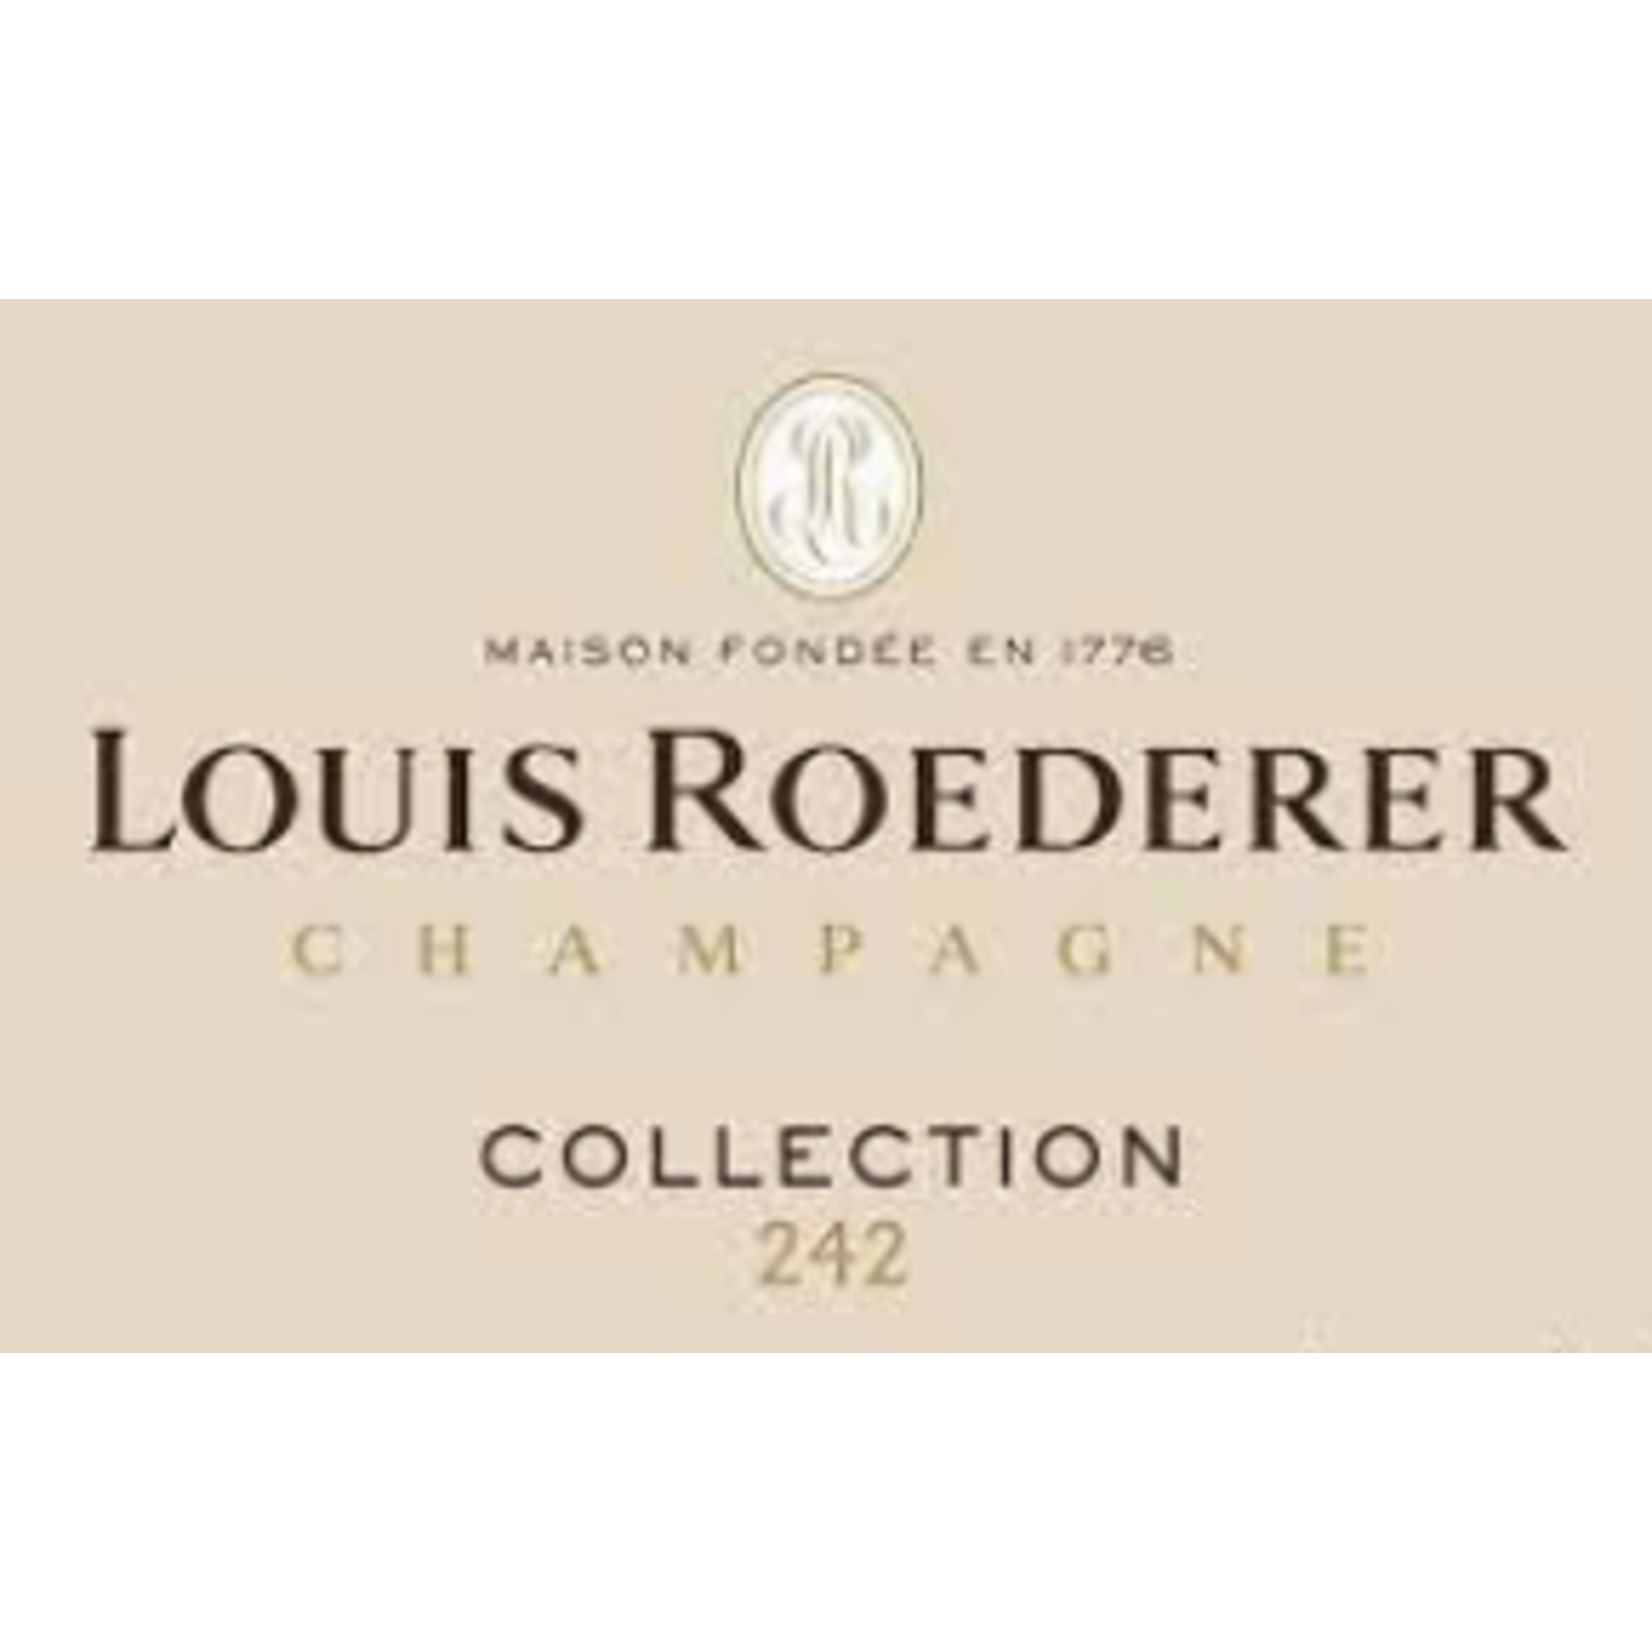 Louis Roeder Louis Roederer Brut Collection 242 Non-Vintage Champagne, France, 94 pts-James Suckling